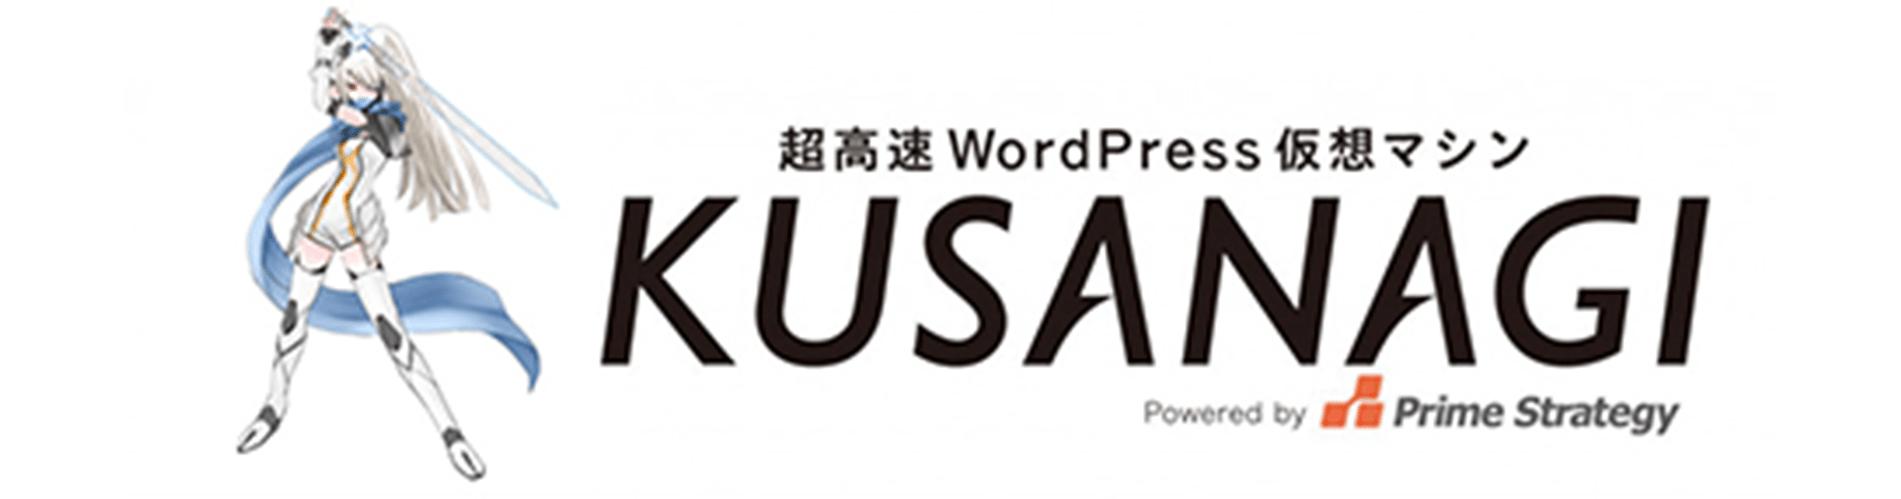 banner_kusanagi_201707ver